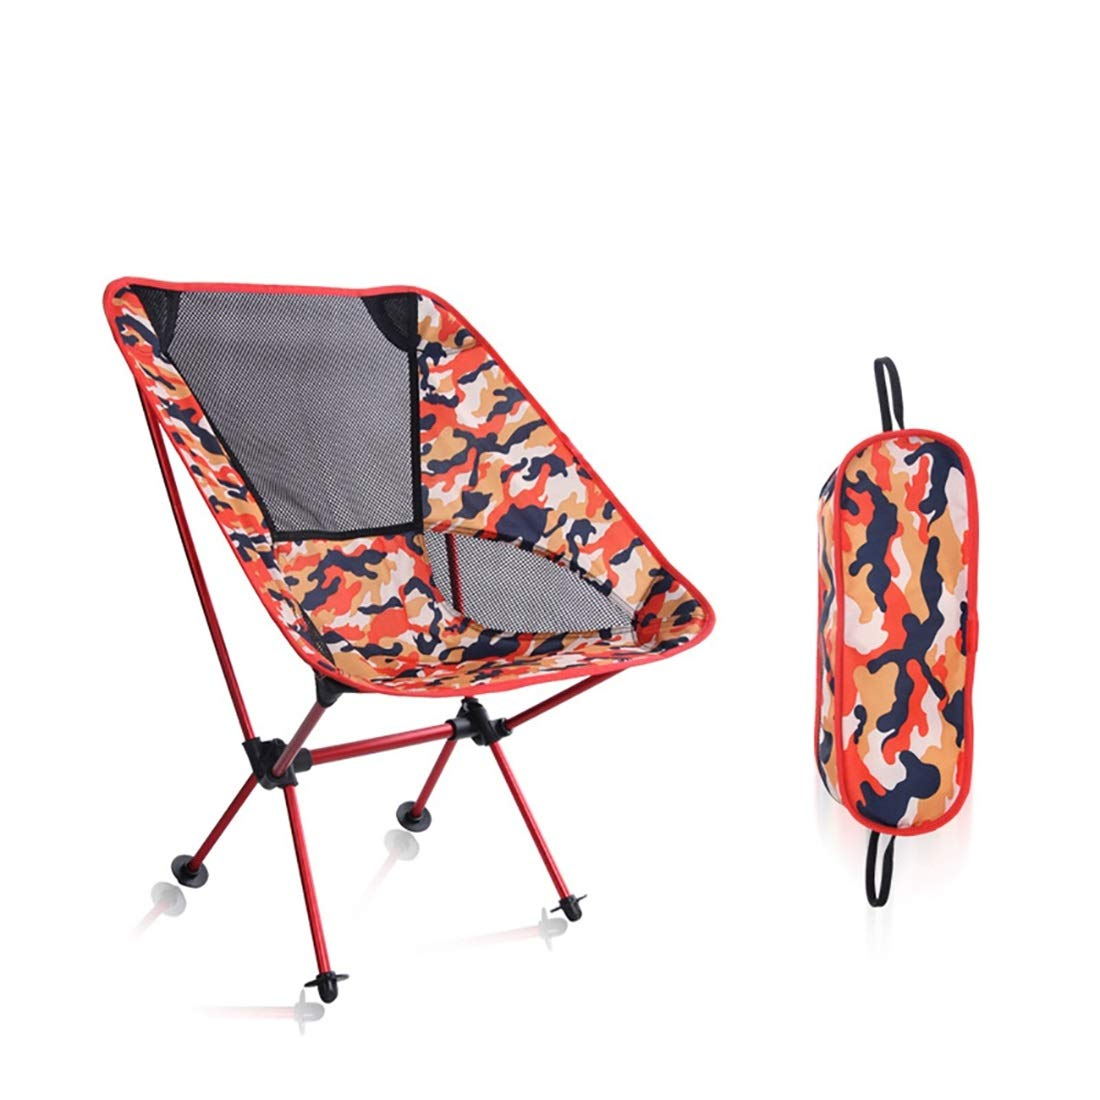 FUBULECY Outdoor-Stuhl Camping-Stuhl Angel-Stuhl Ultraleichter Stuhl Portable compact Einfacher Speicher Fall mit beweglichem Fall Bequemer kampierender Grill